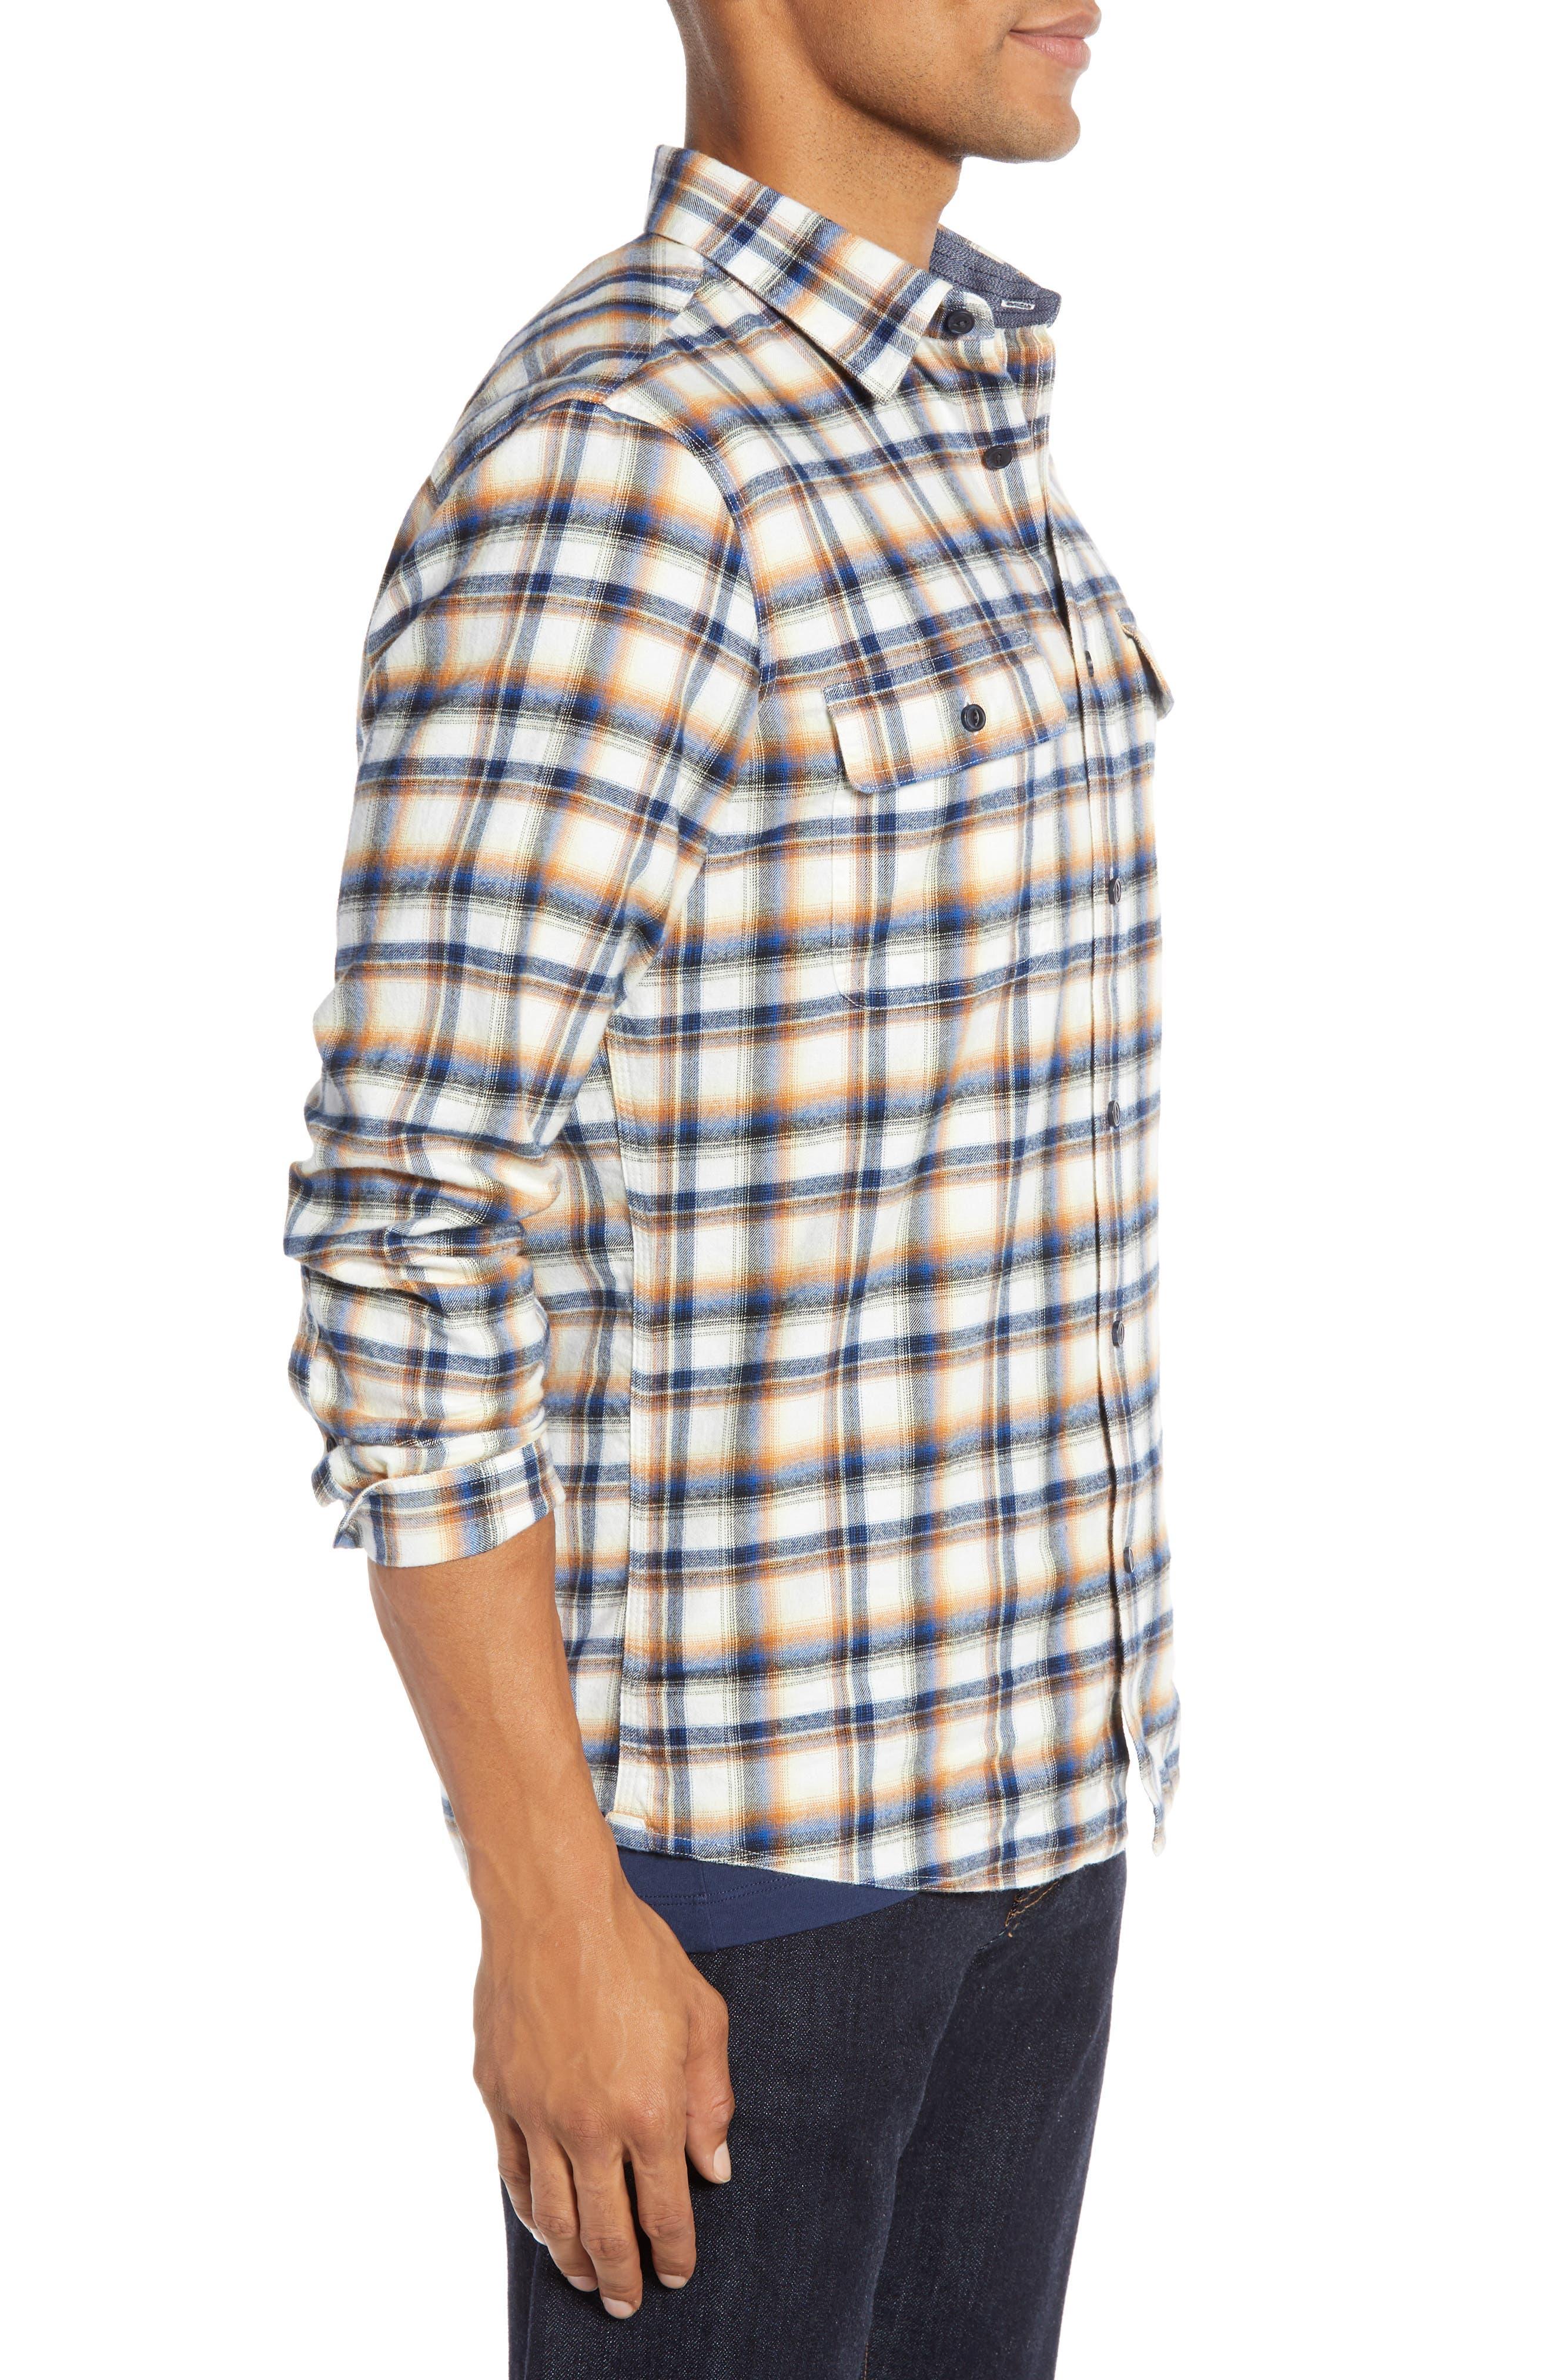 Trim Fit Trucker Plaid Sport Shirt,                             Alternate thumbnail 4, color,                             IVORY BLUE ORANGE PLAID